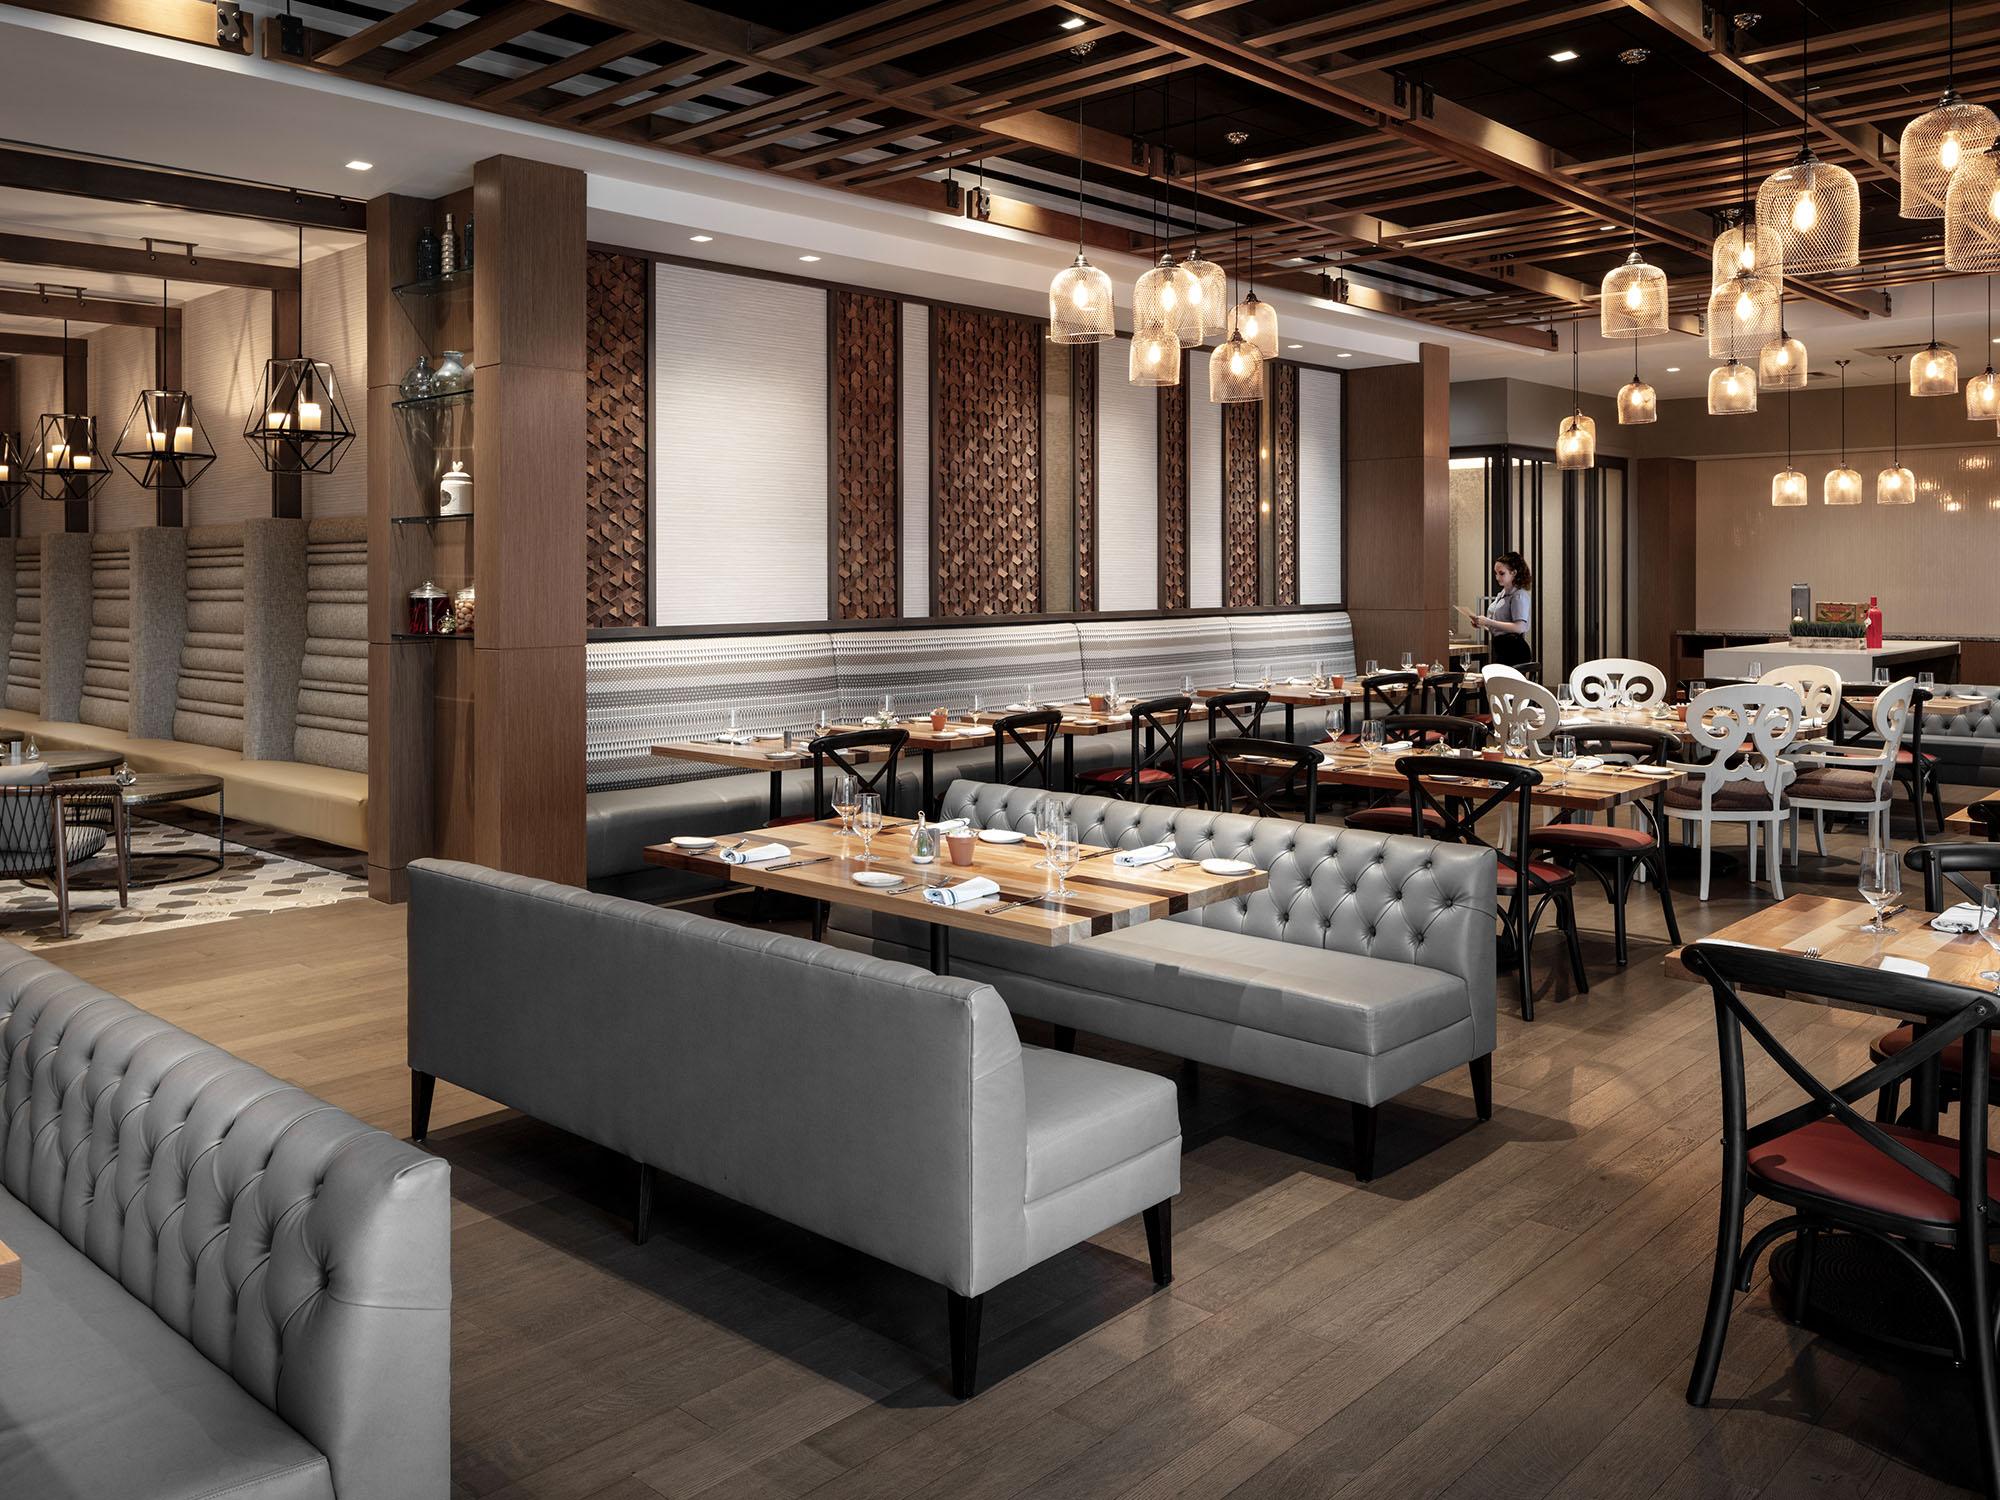 Hilton Miami Dadeland Hospitality Furniture Design _0002_RTKL_050819_9369.jpg